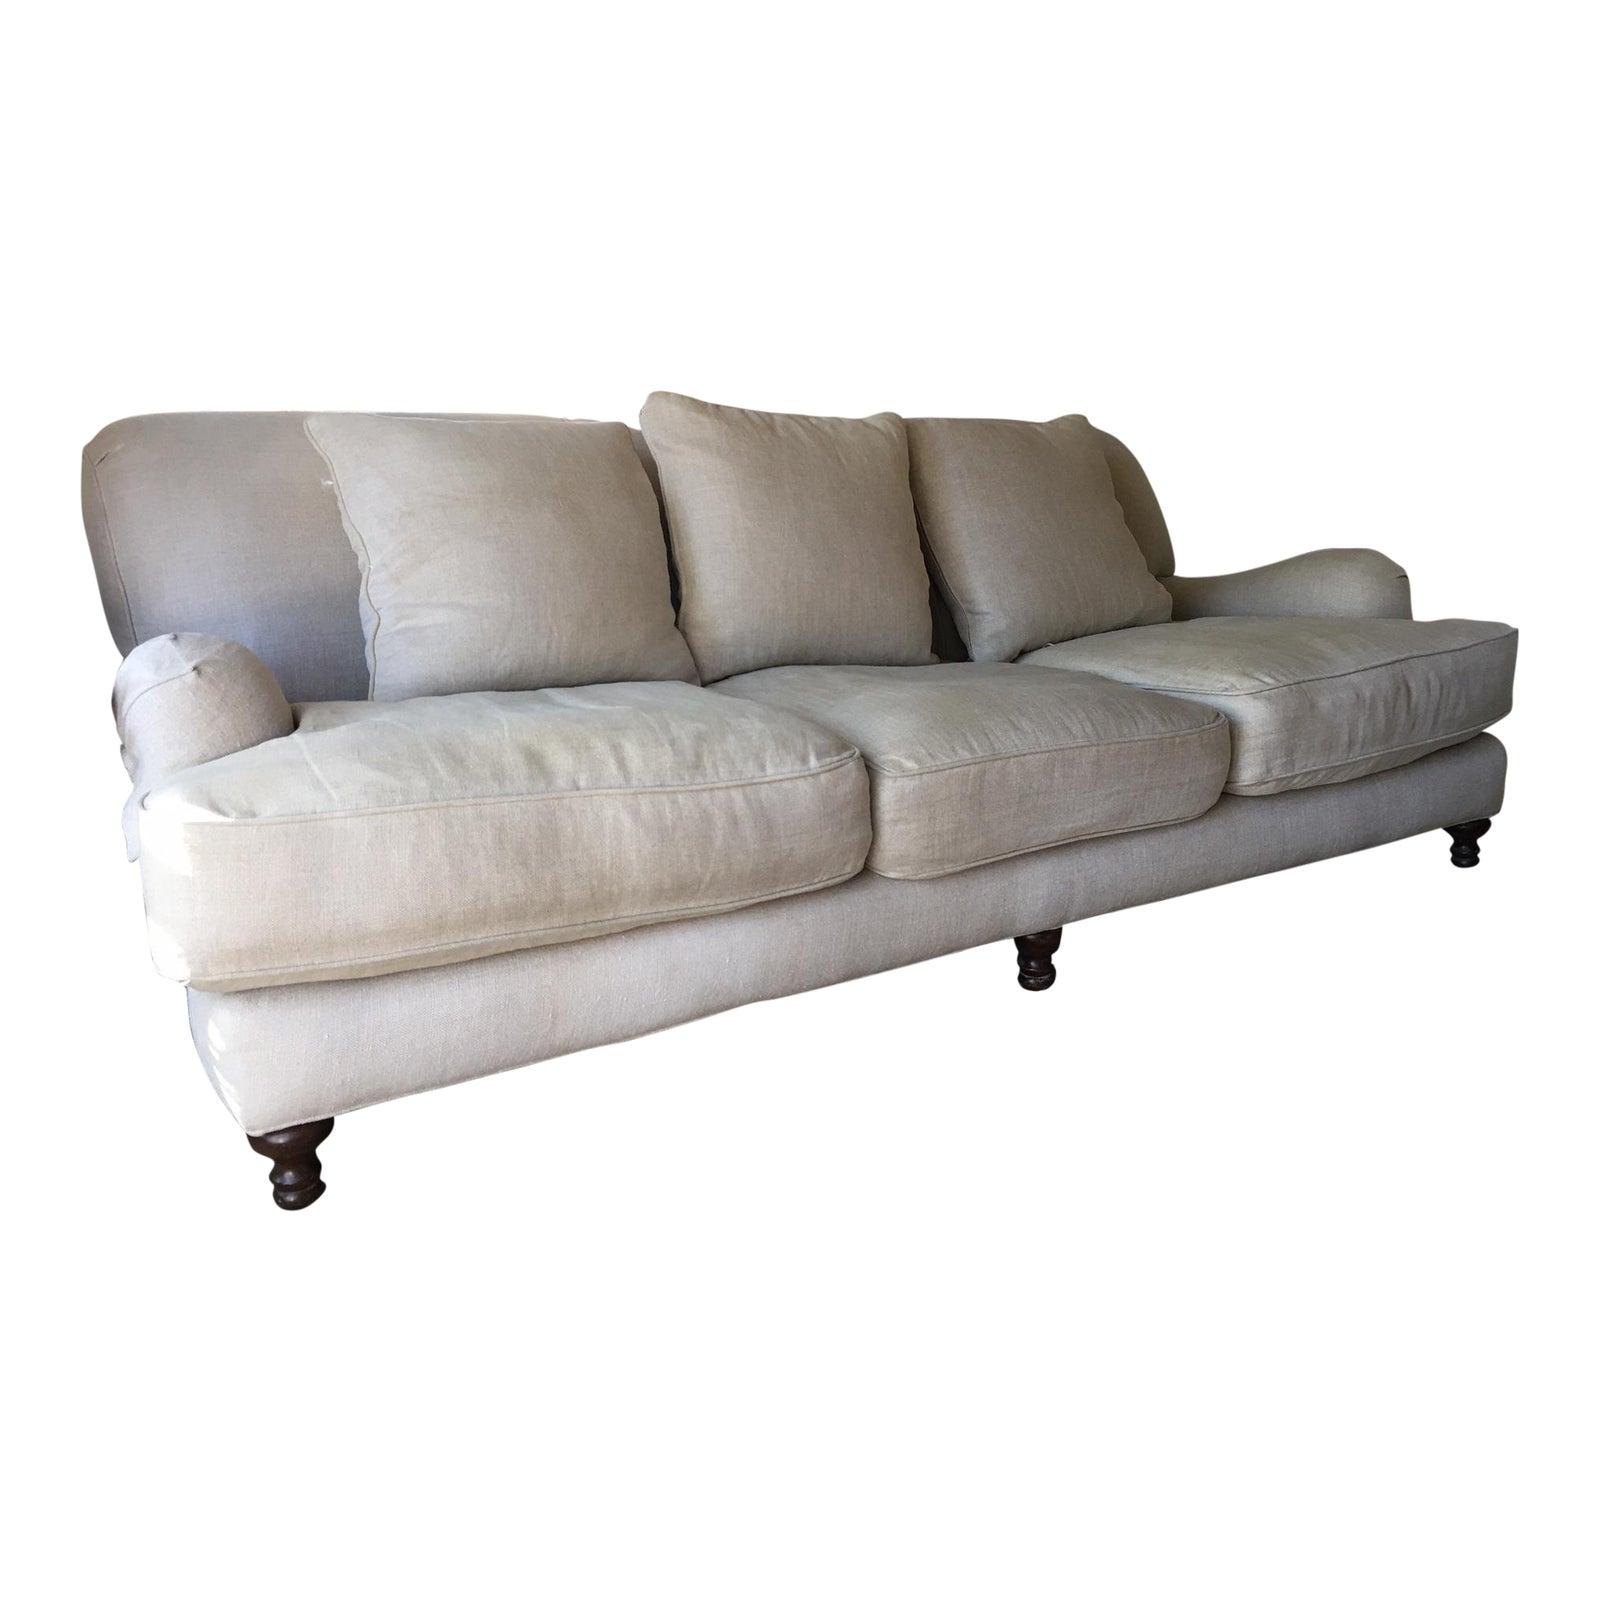 Restoration Hardware Sand Linen English Roll Arm Sofa | Chairish